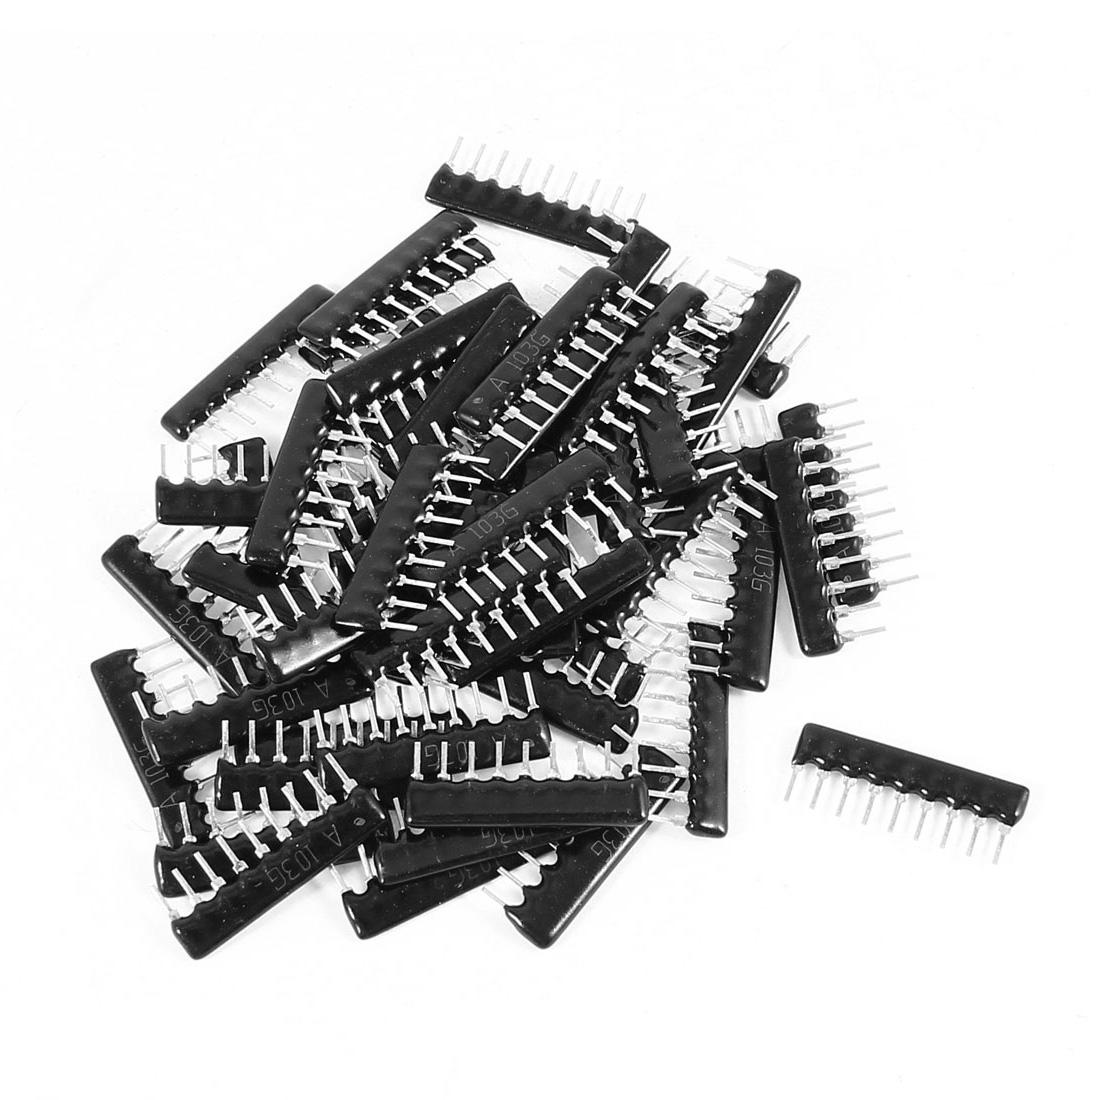 50Pcs 9A-103J 10K Ohm 5% Tolerance 2.54mm Pitch 9 Pin Lead Network Resistors